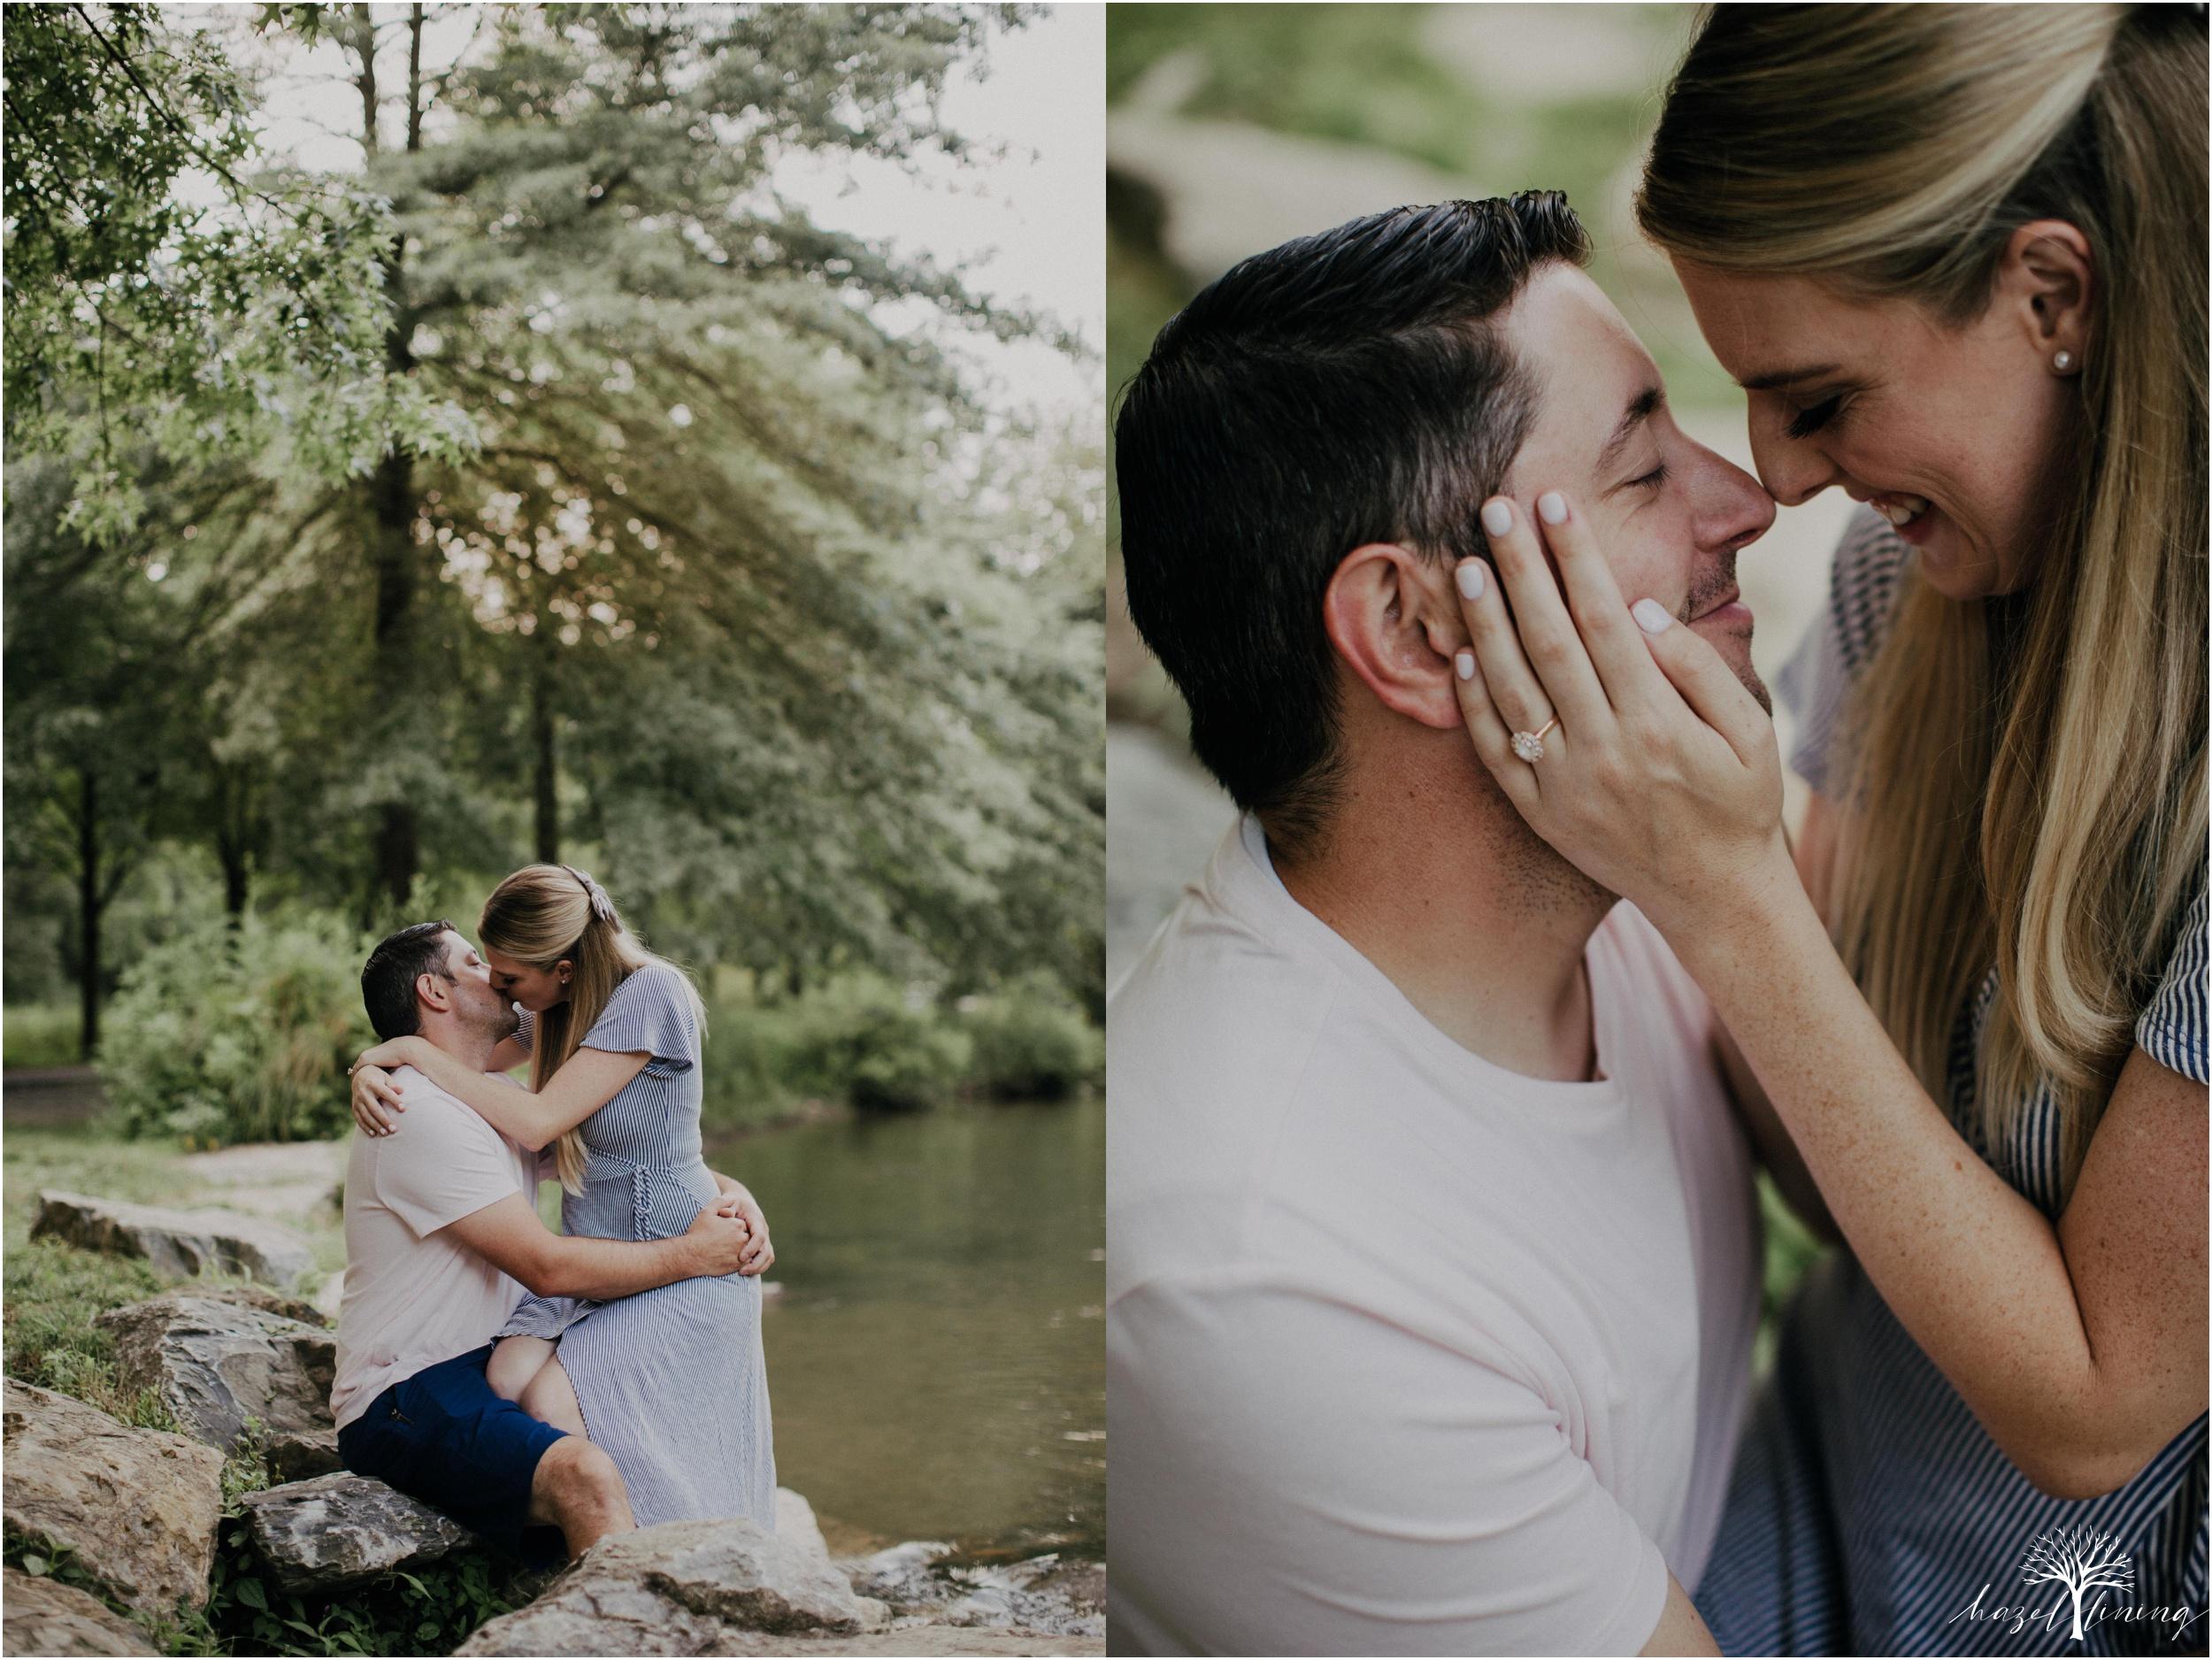 ashley-fillmore-steve-reimer-trexler-nature-preserve-summer-engagement-session-schnecksville-pennsylvania-hazel-lining-photography-destination-elopement-wedding-engagement-photography_0002.jpg